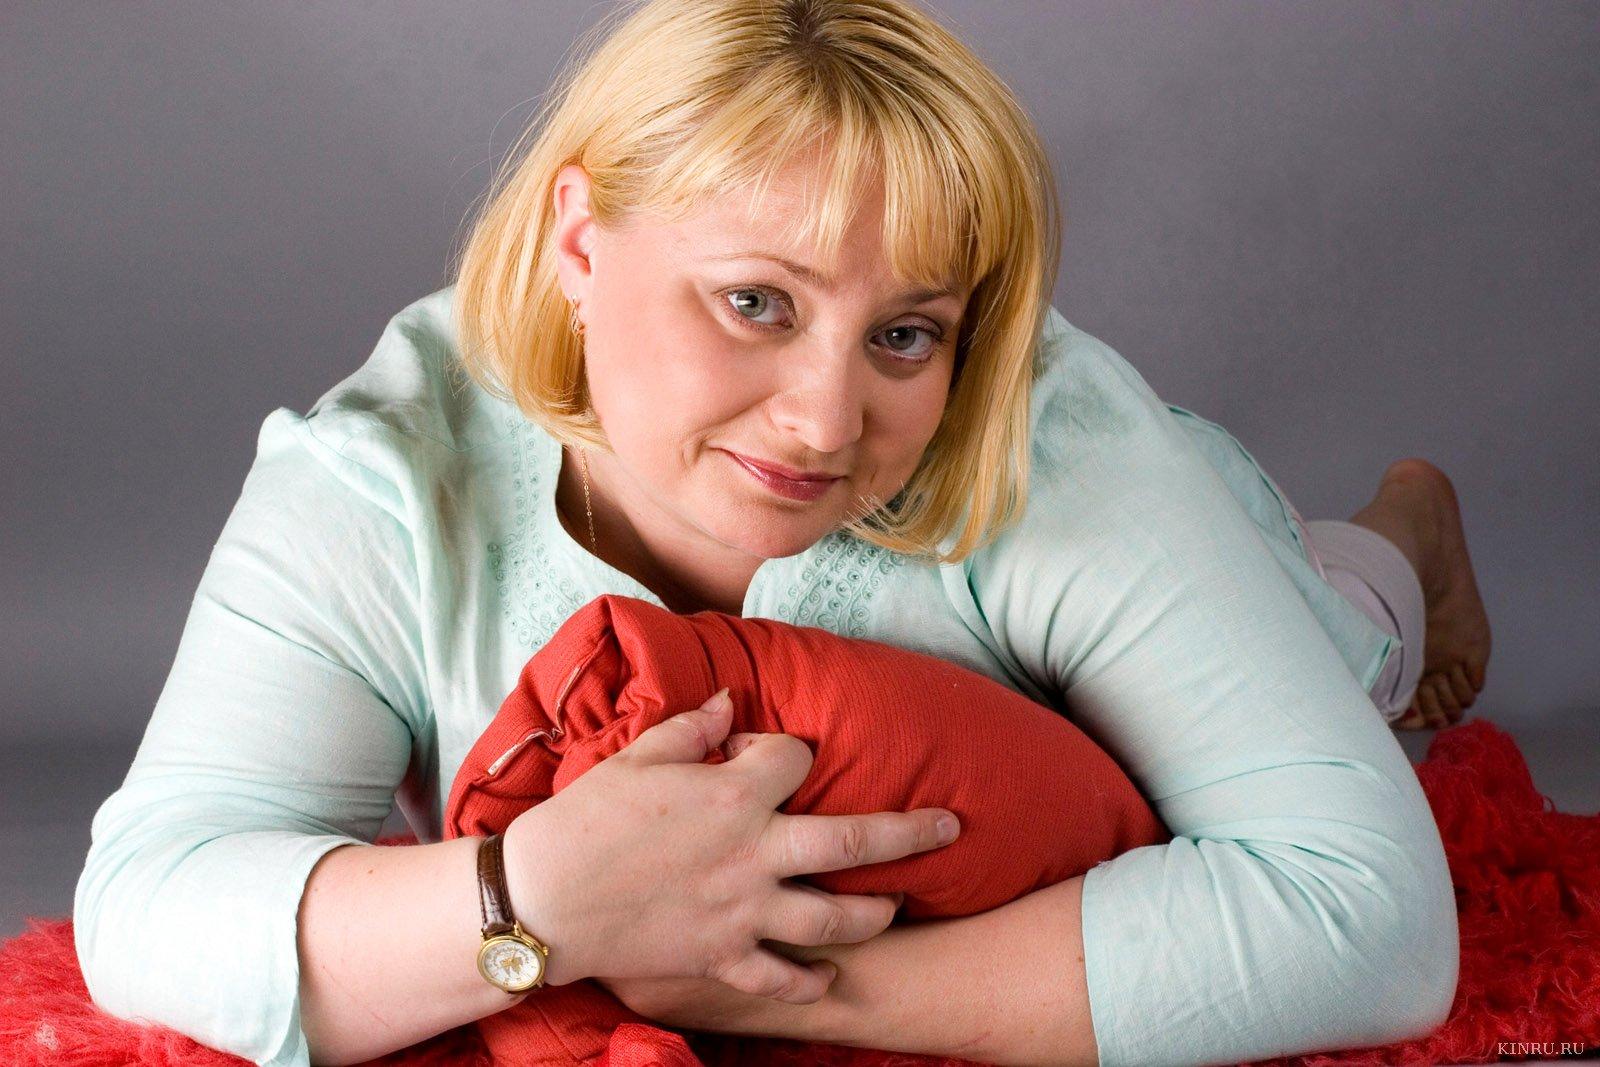 Светлана Пермякова - фото №2